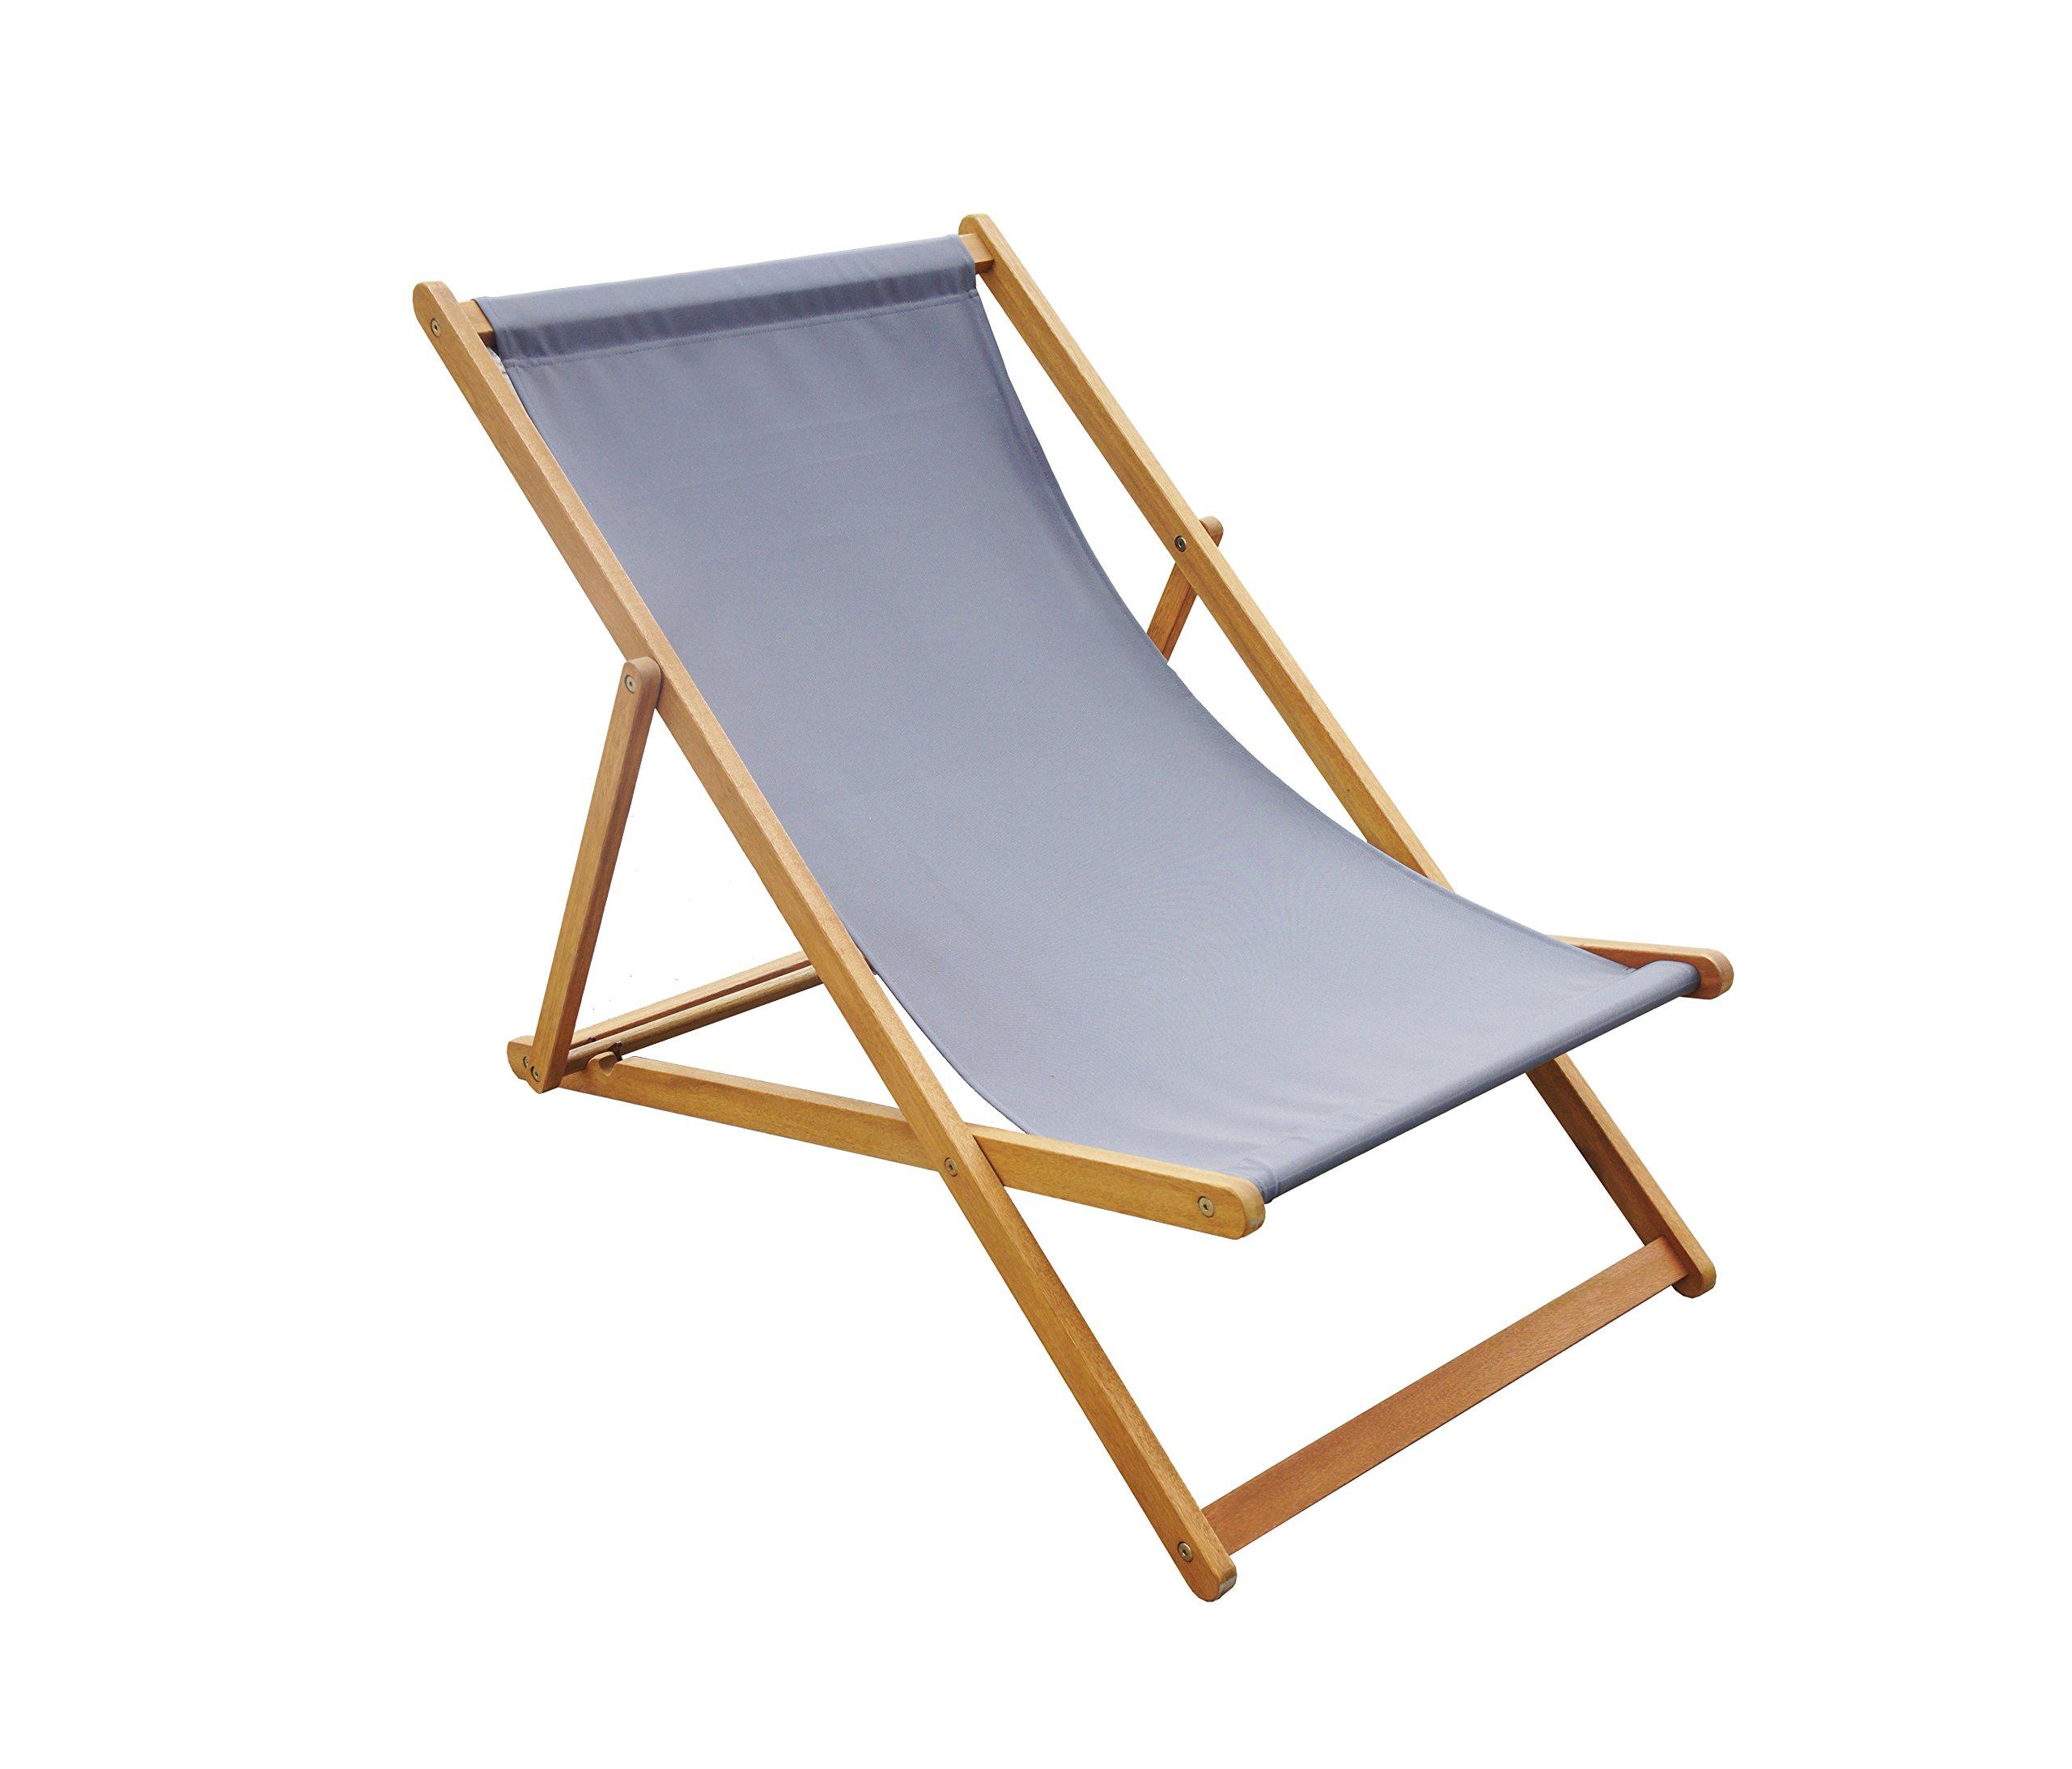 Chair Cushion Square Foam for Dinning Chairs, Wheelchair Seat Cushion Replacement FOAMMA 2-Pack 2 x 16 x 16 HD Upholstery Foam High Density Foam